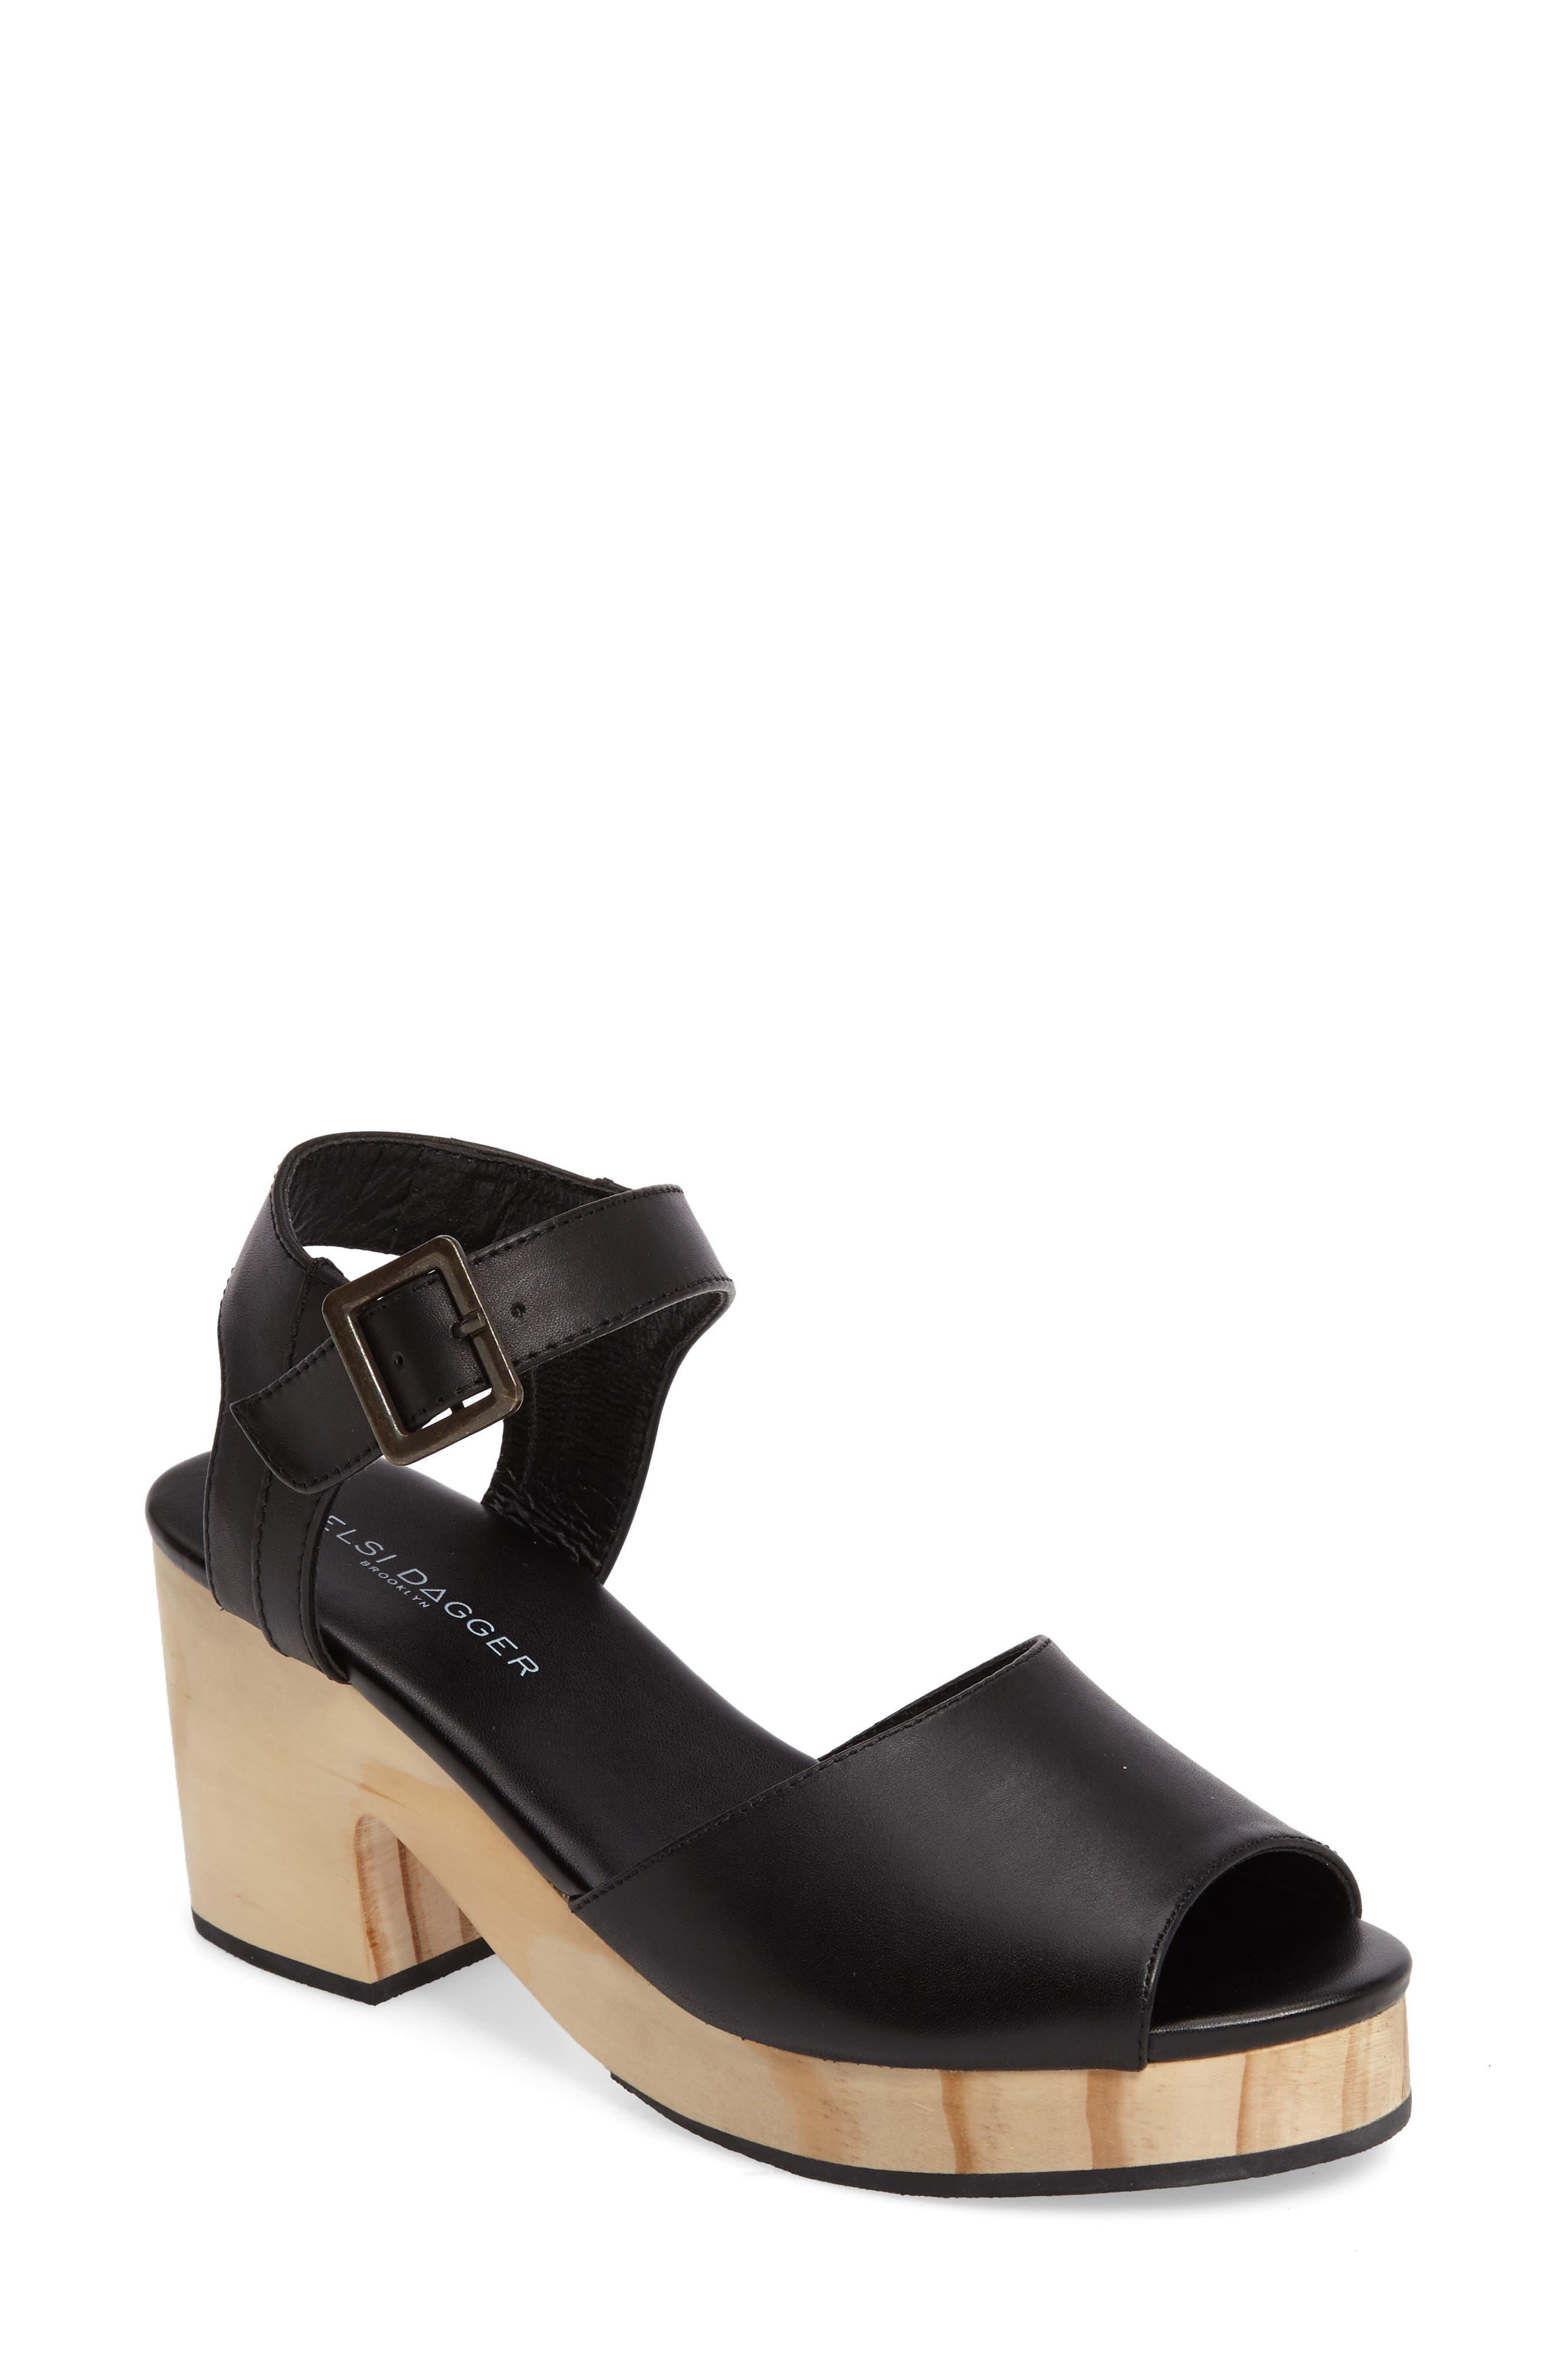 Montgomery Platform Sandal,                         Main,                         color, Black Leather